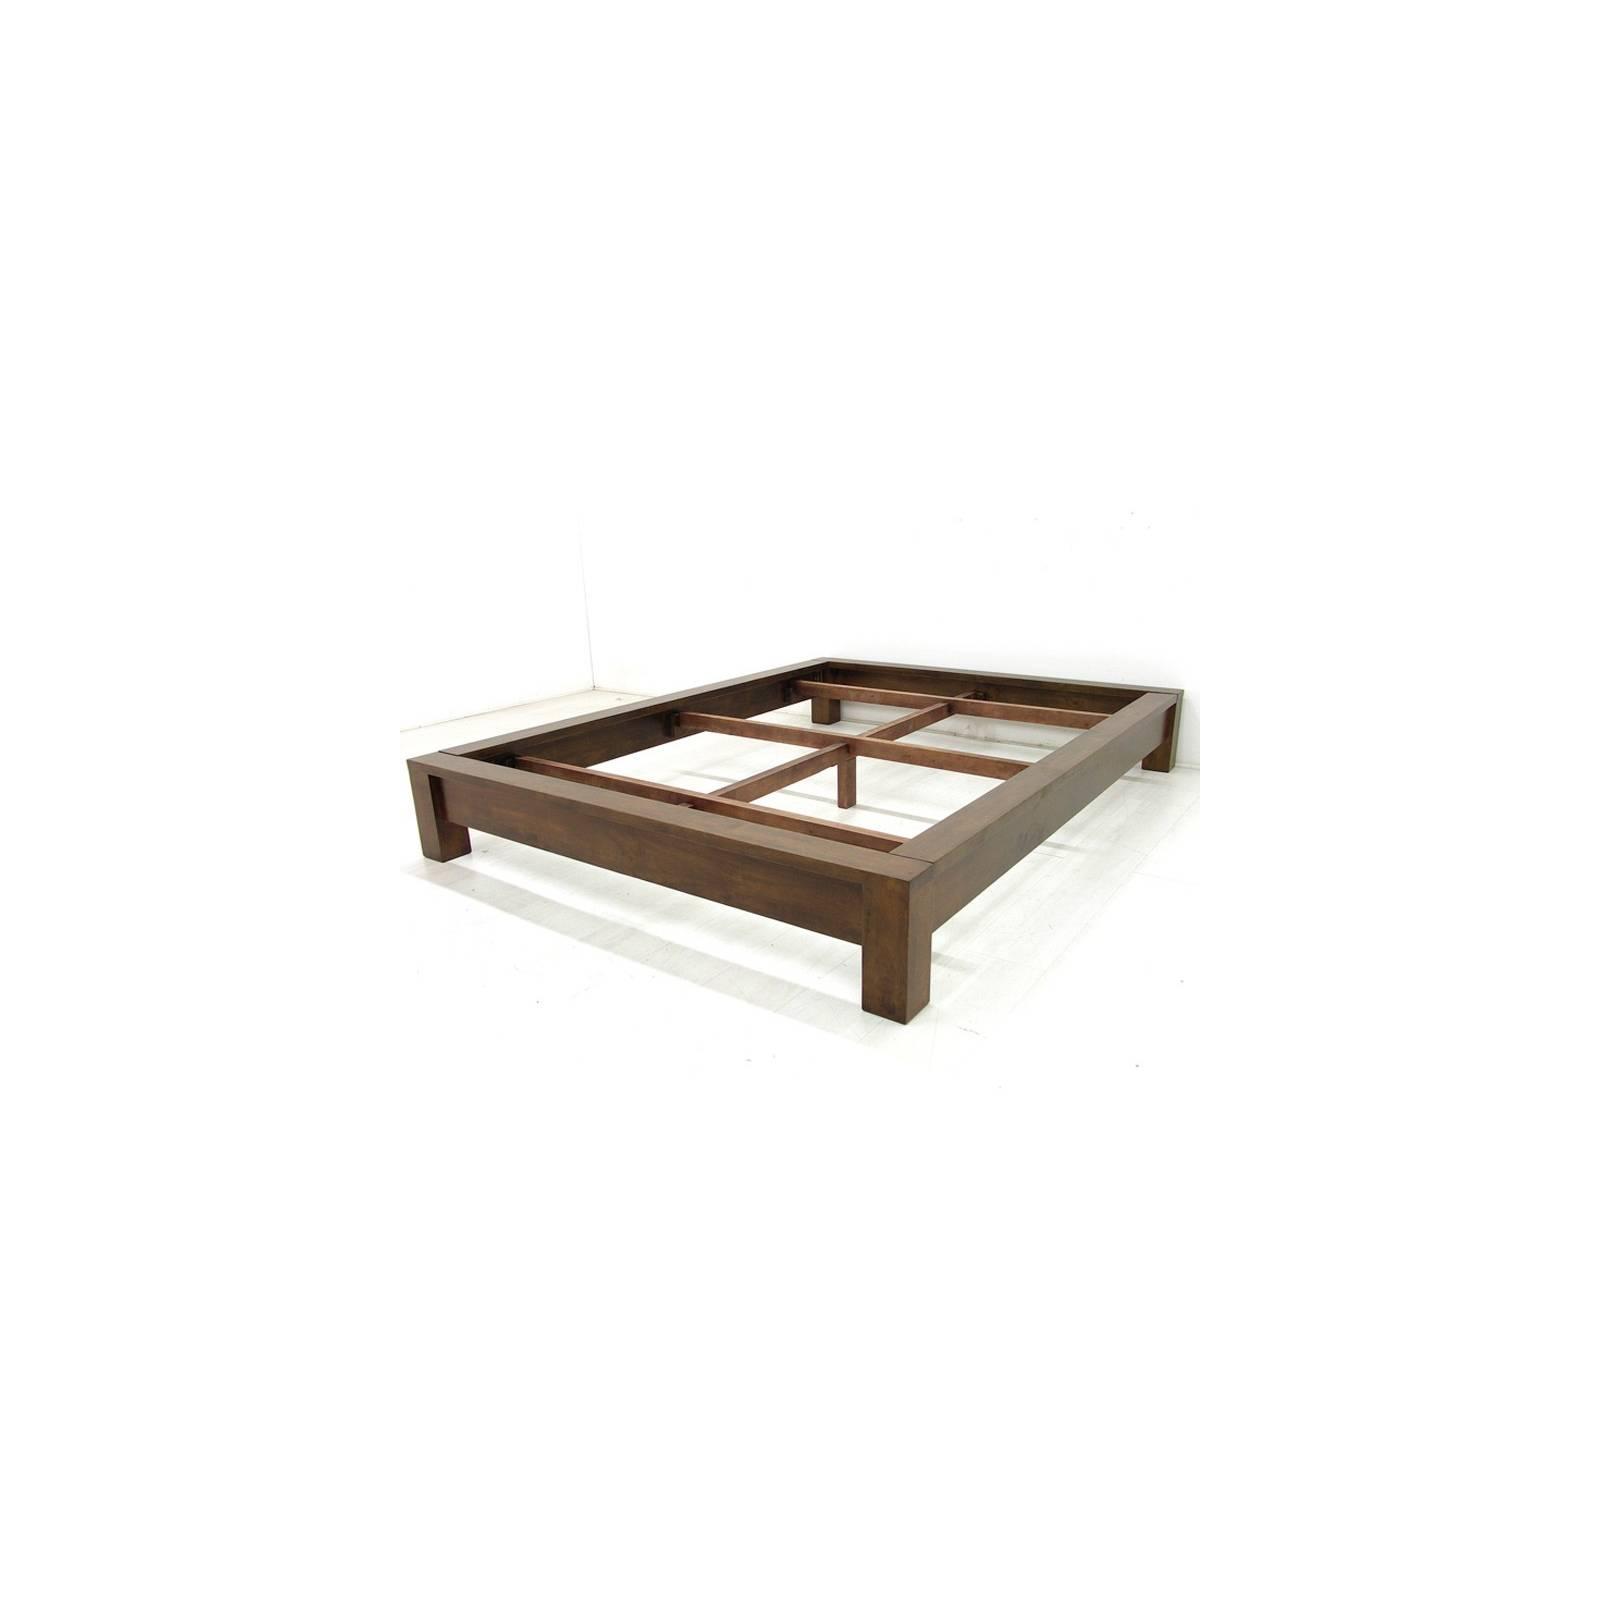 Lit 160 Omega Hévéa - meuble style design